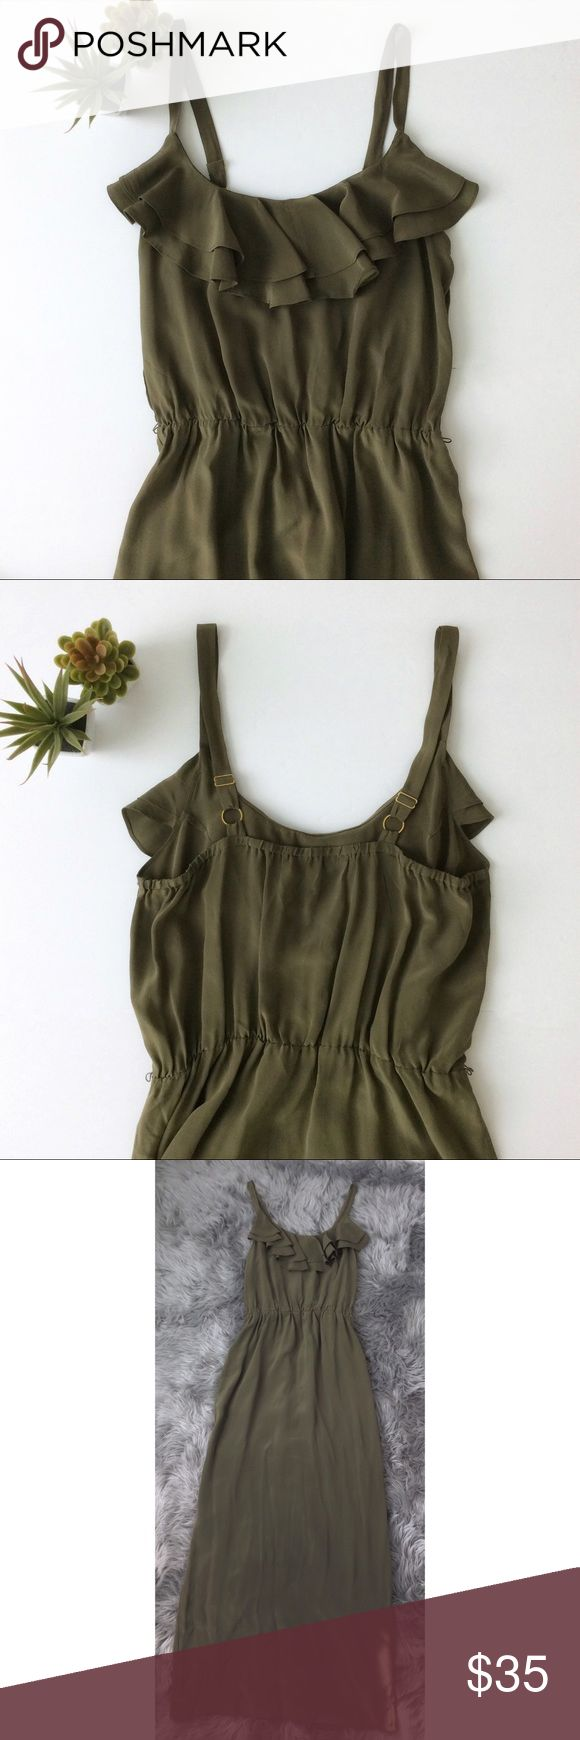 Calvin Klein Silk Maxi Dress 100% silk maxi dress by Calvin Klein in a beautiful olive green.  Elasticized waist.  Ruffle neckline.  Adjustable straps.  Very feminine and flowy. Calvin Klein Dresses Maxi